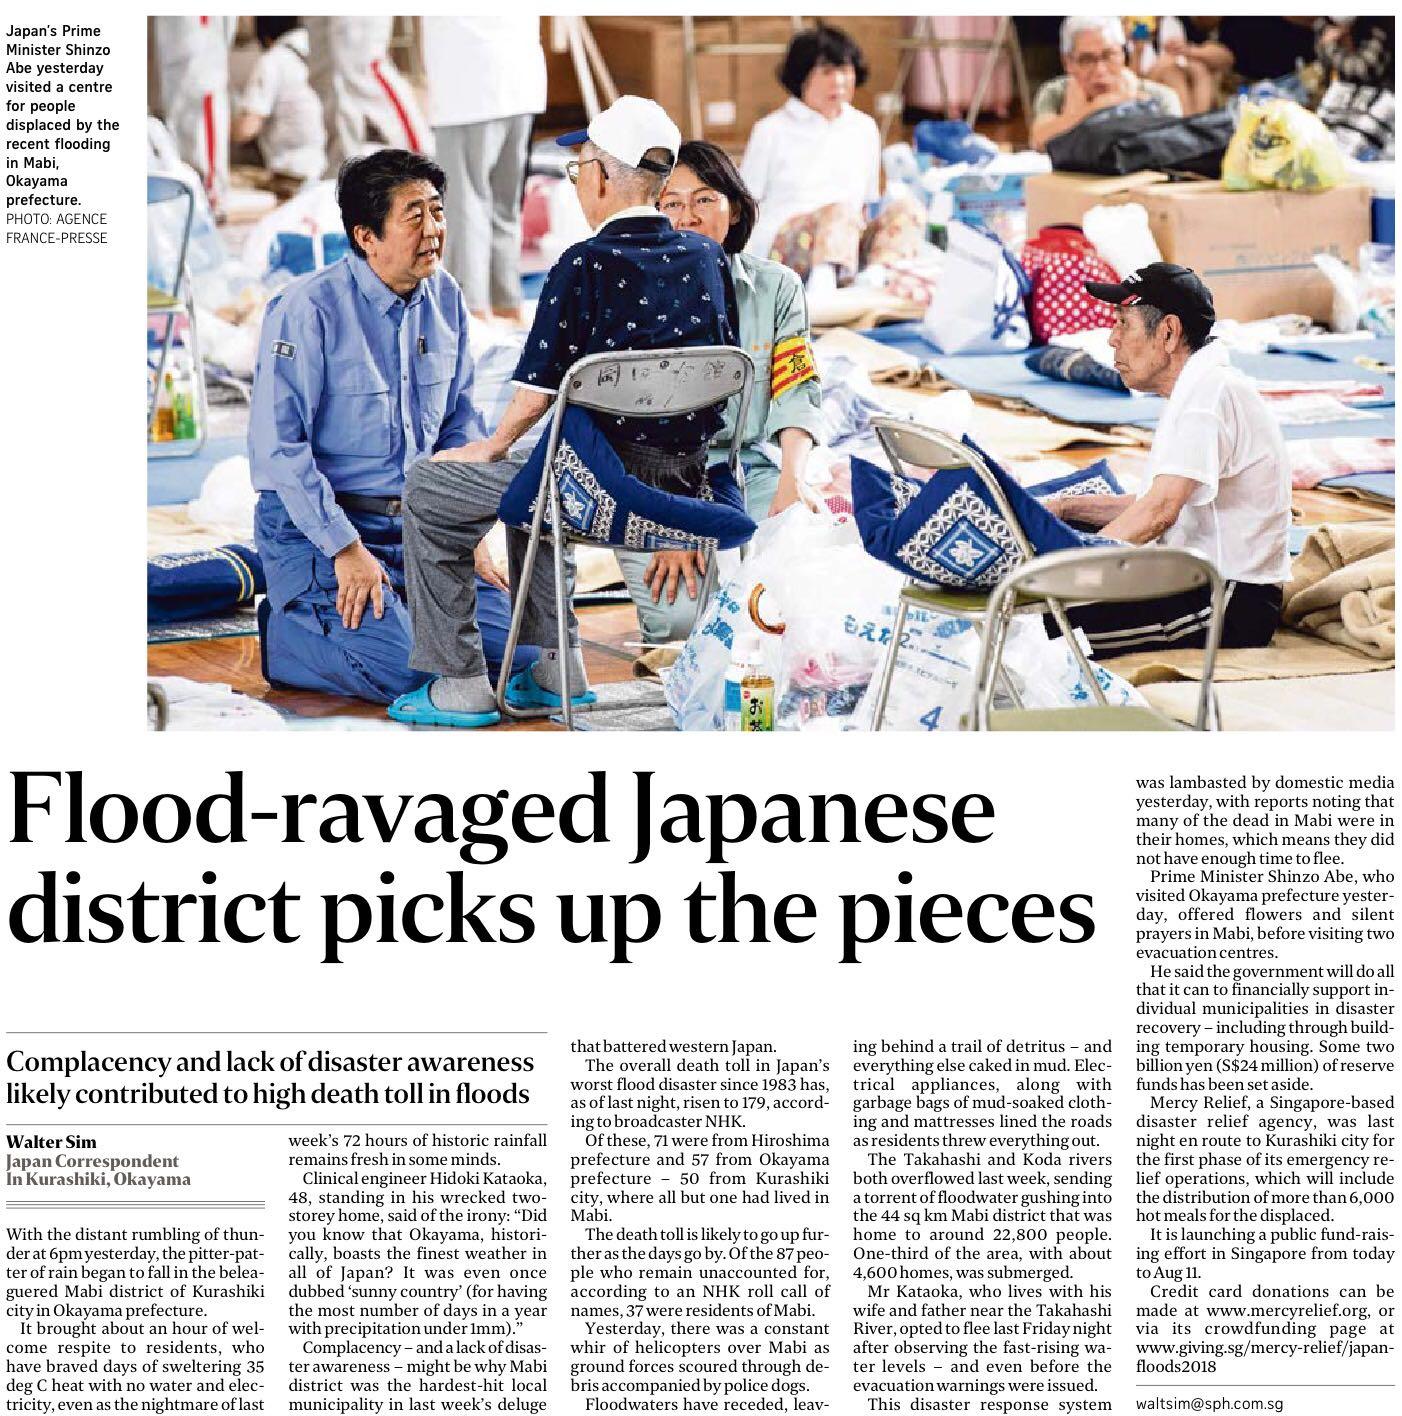 The Straits Times, 12 July 2018 - Flood-ravaged Japanese